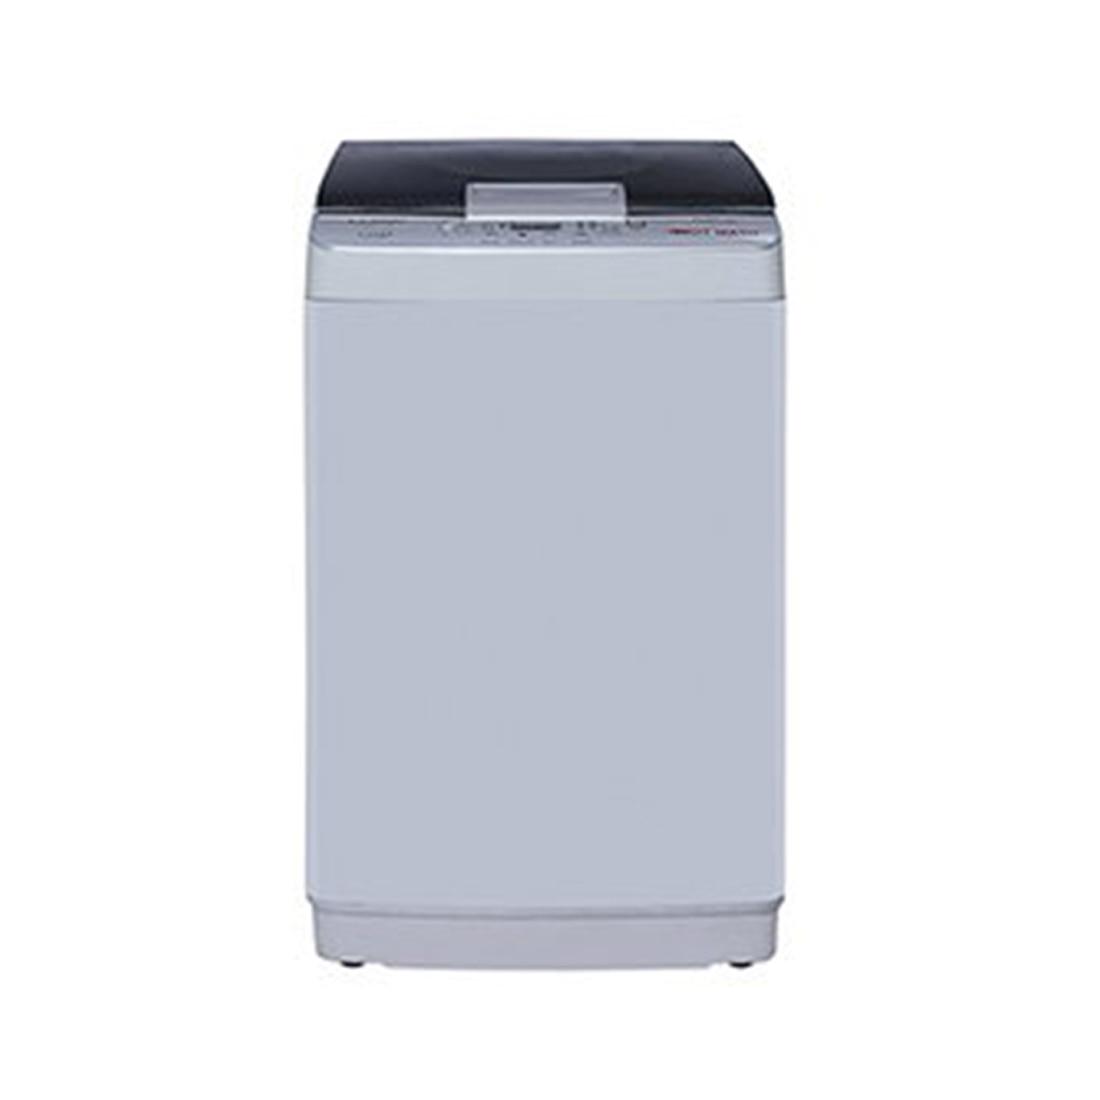 Lloyd 7.2 Kg Fully Automatic Top Load Washing Machine (LWMT72H, White)